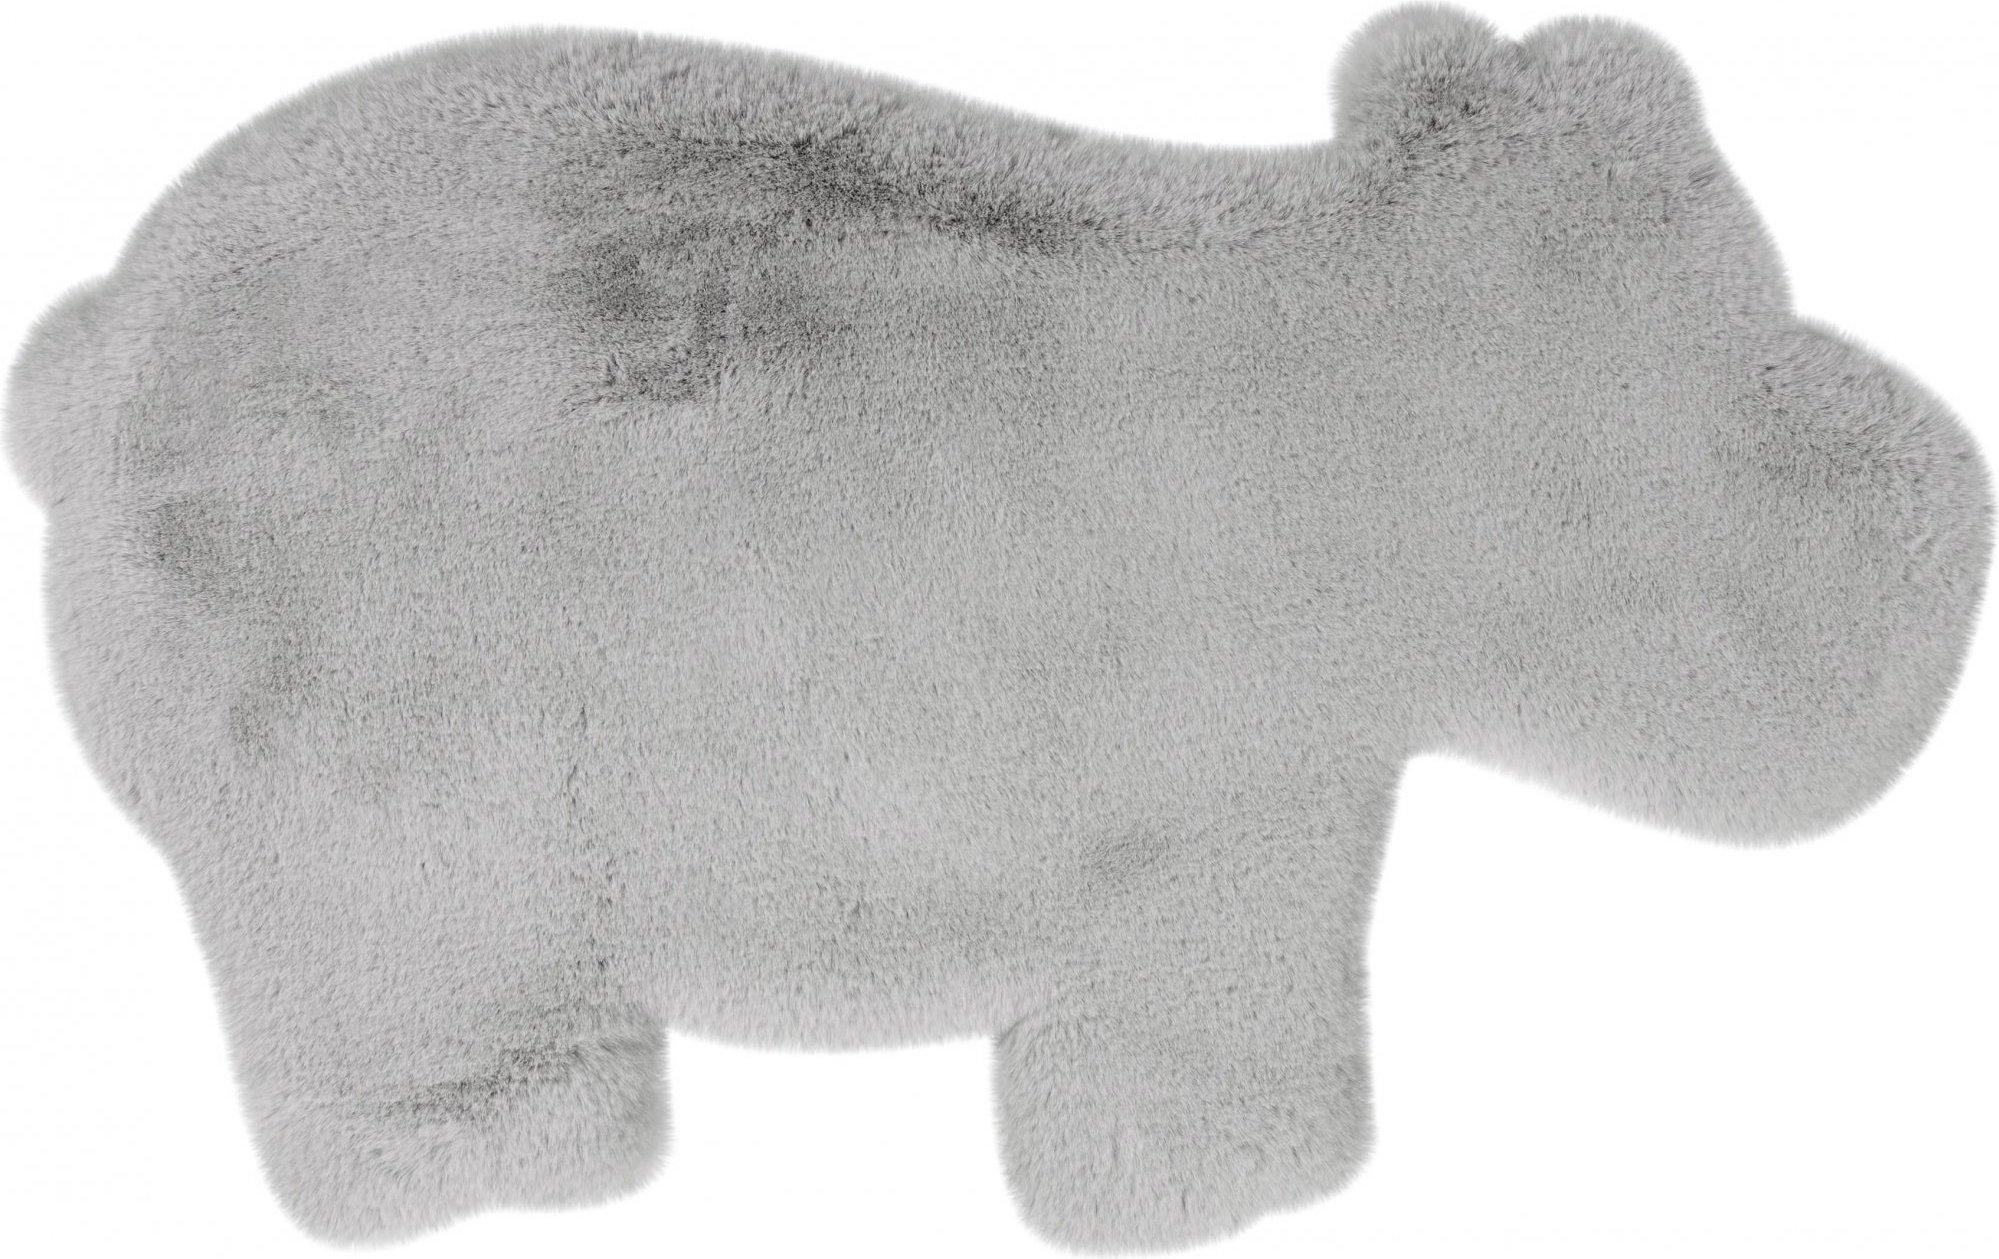 Tapis enfant gris rectangle micropolyester 55x90